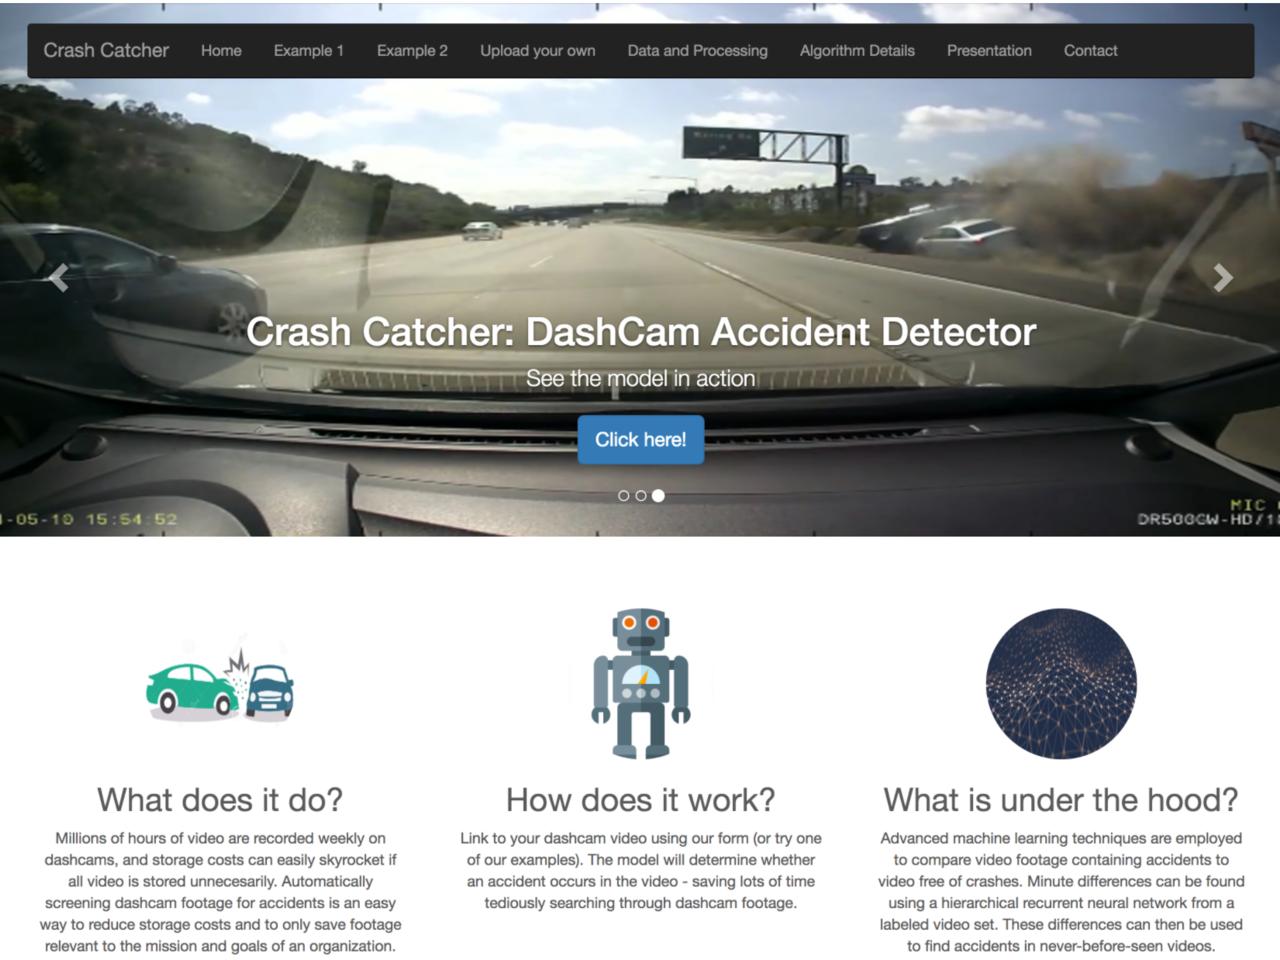 Crash Catcher: Detecting Car Crashes in Video